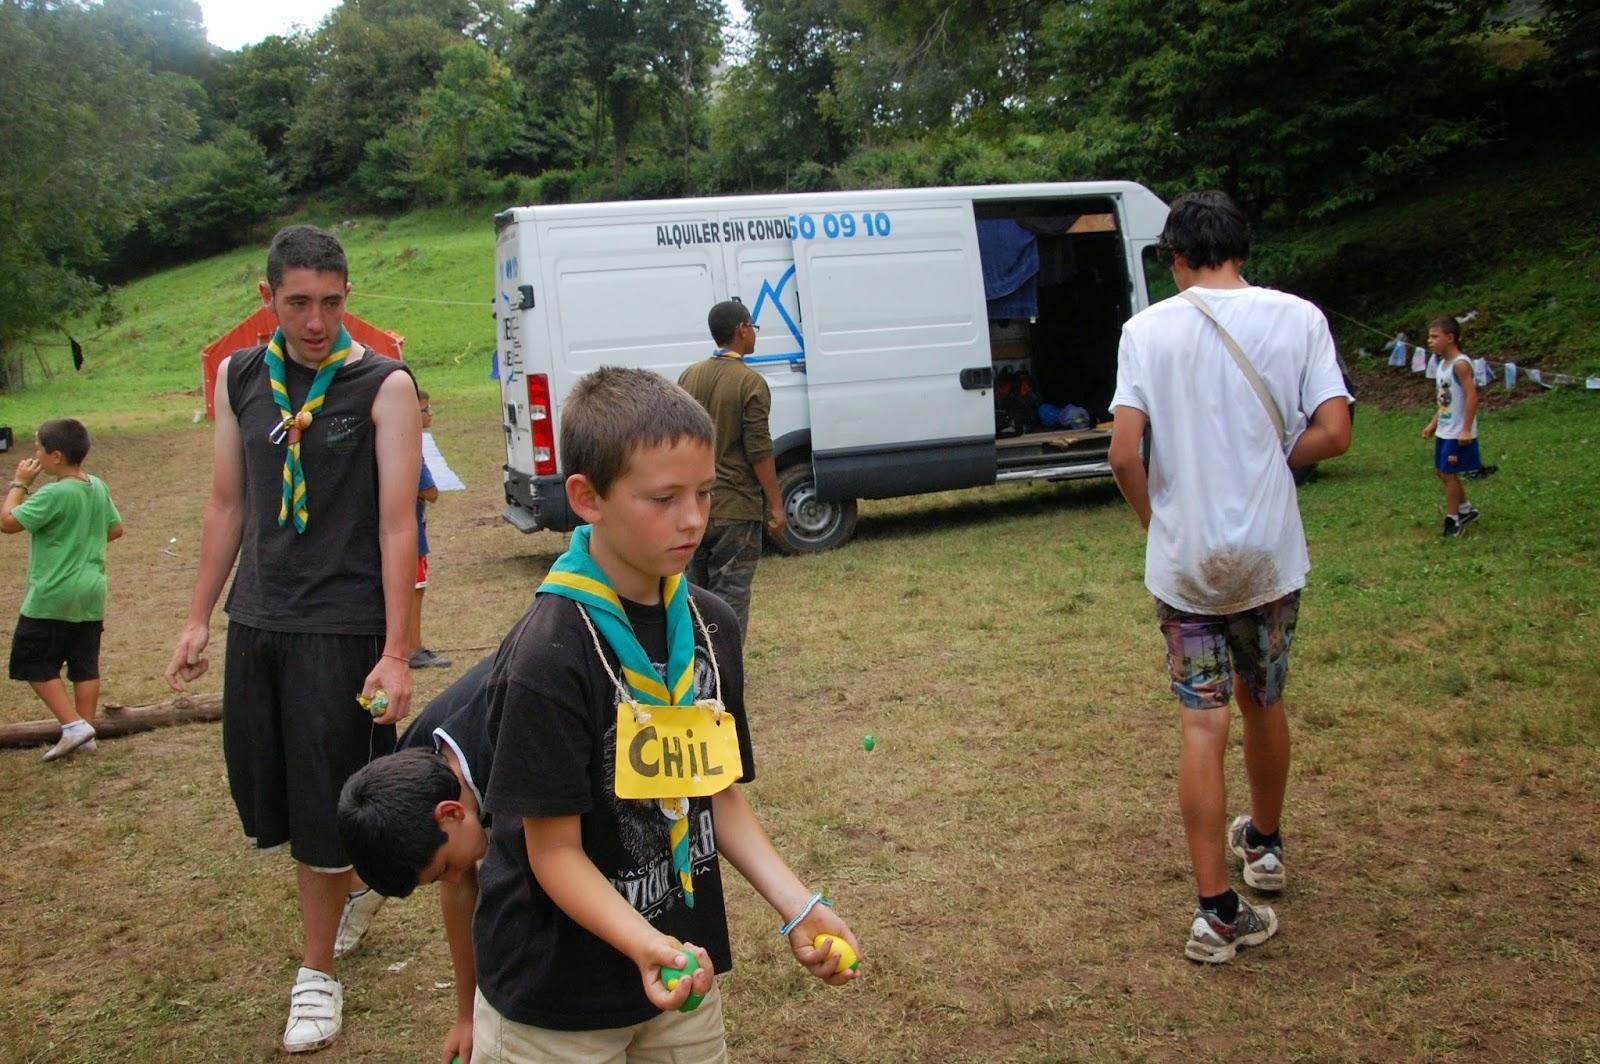 Campaments Estiu RolandKing 2011 - DSC_0237.JPG